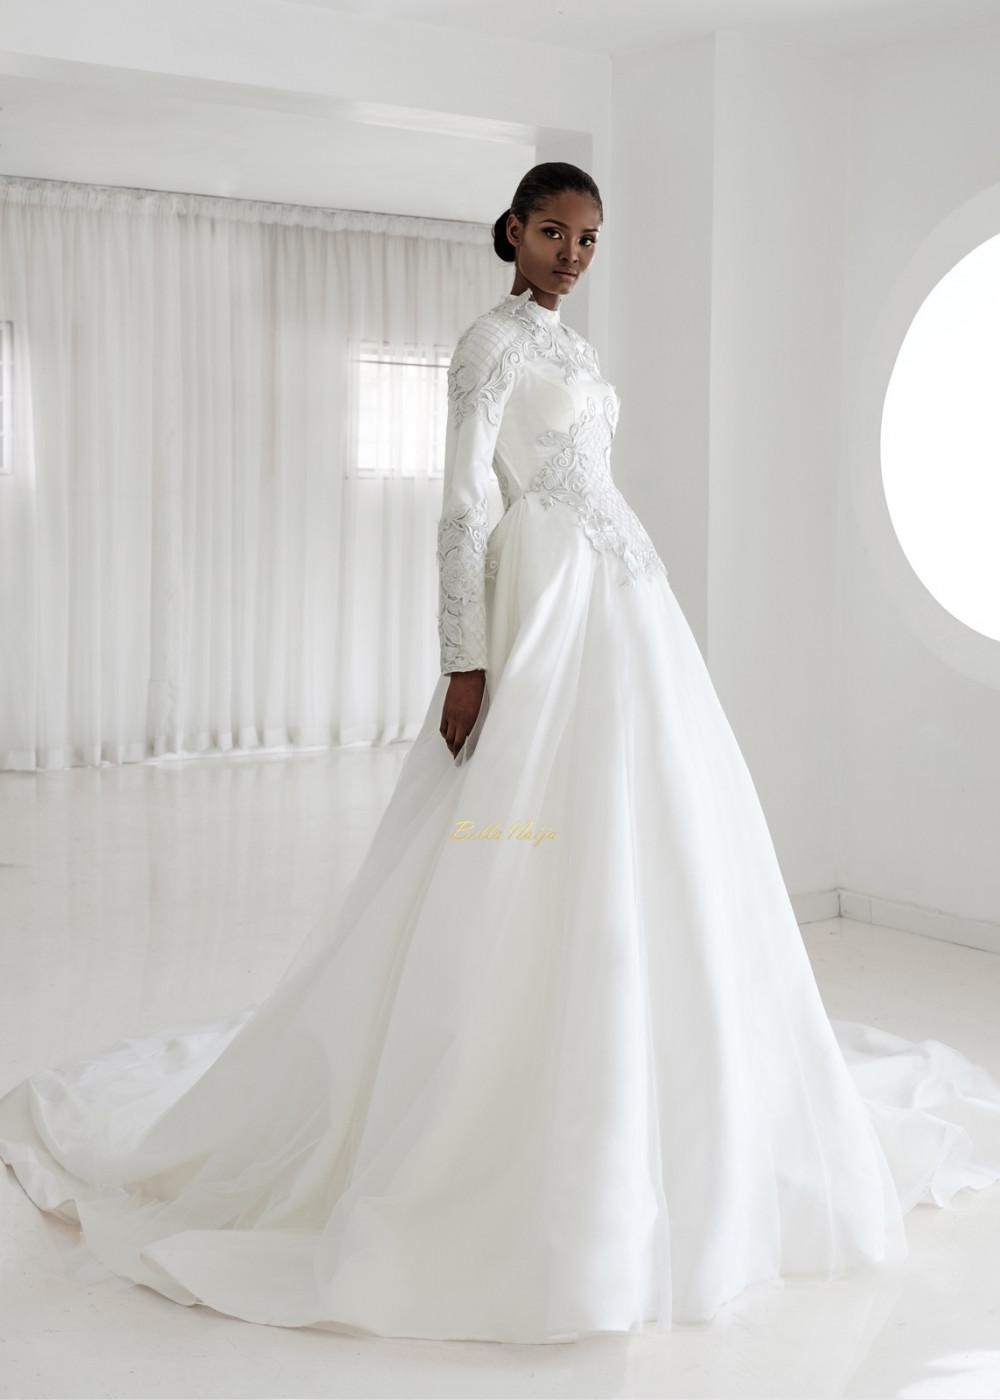 Bn Bridal Andrea Iyamah Releases Its 2018 Bridal Collection